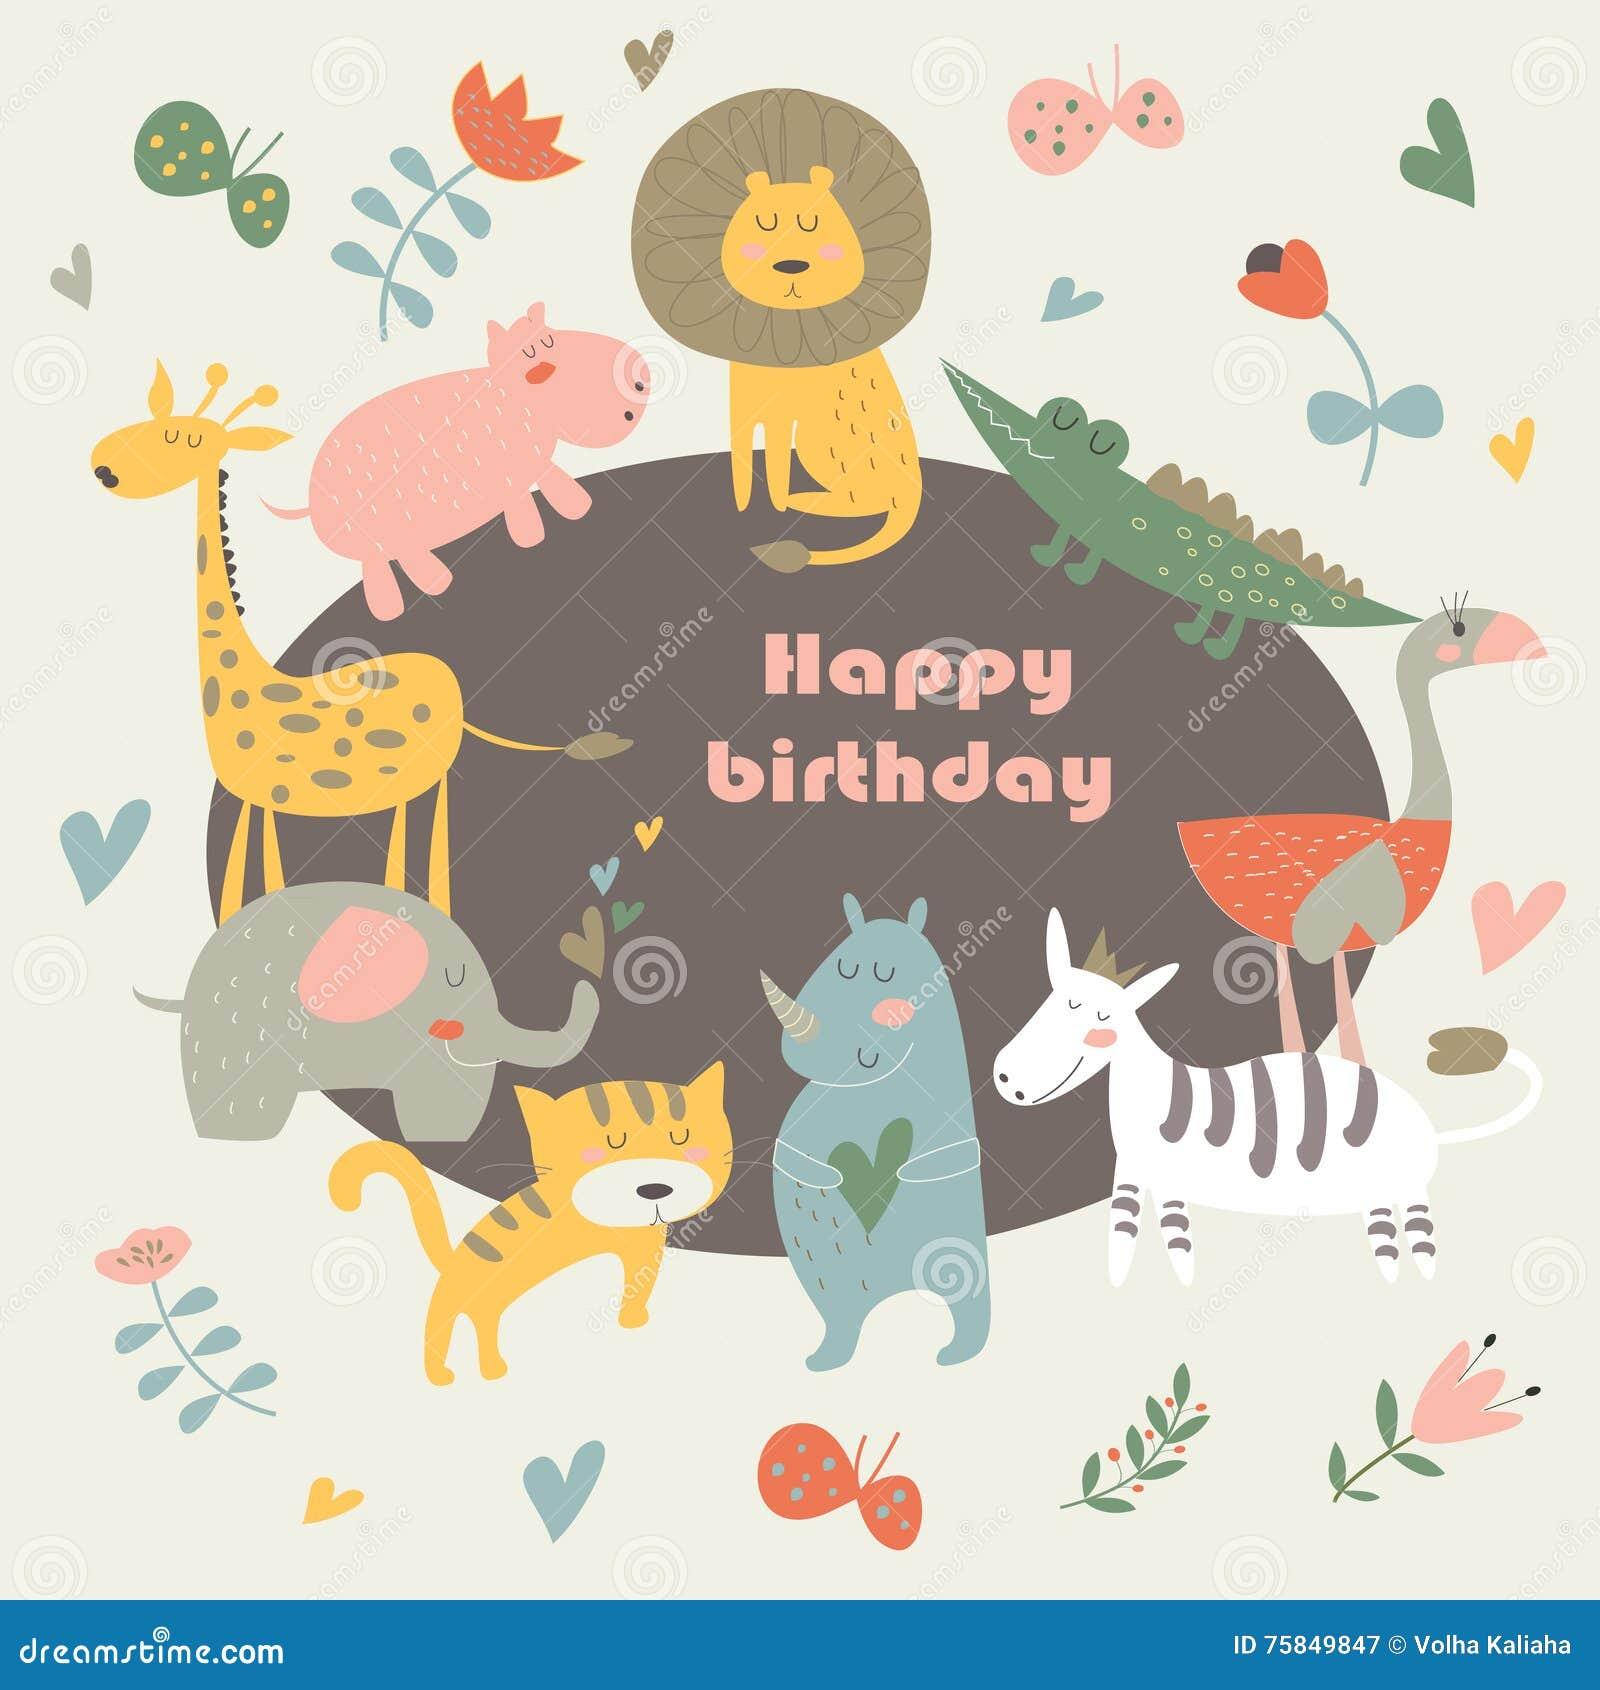 Birthday Card With Africa Animals Cute Alligator Tiger Lion Elephant Rhino Hippo Ostrich And Zebra In Cartoon Style